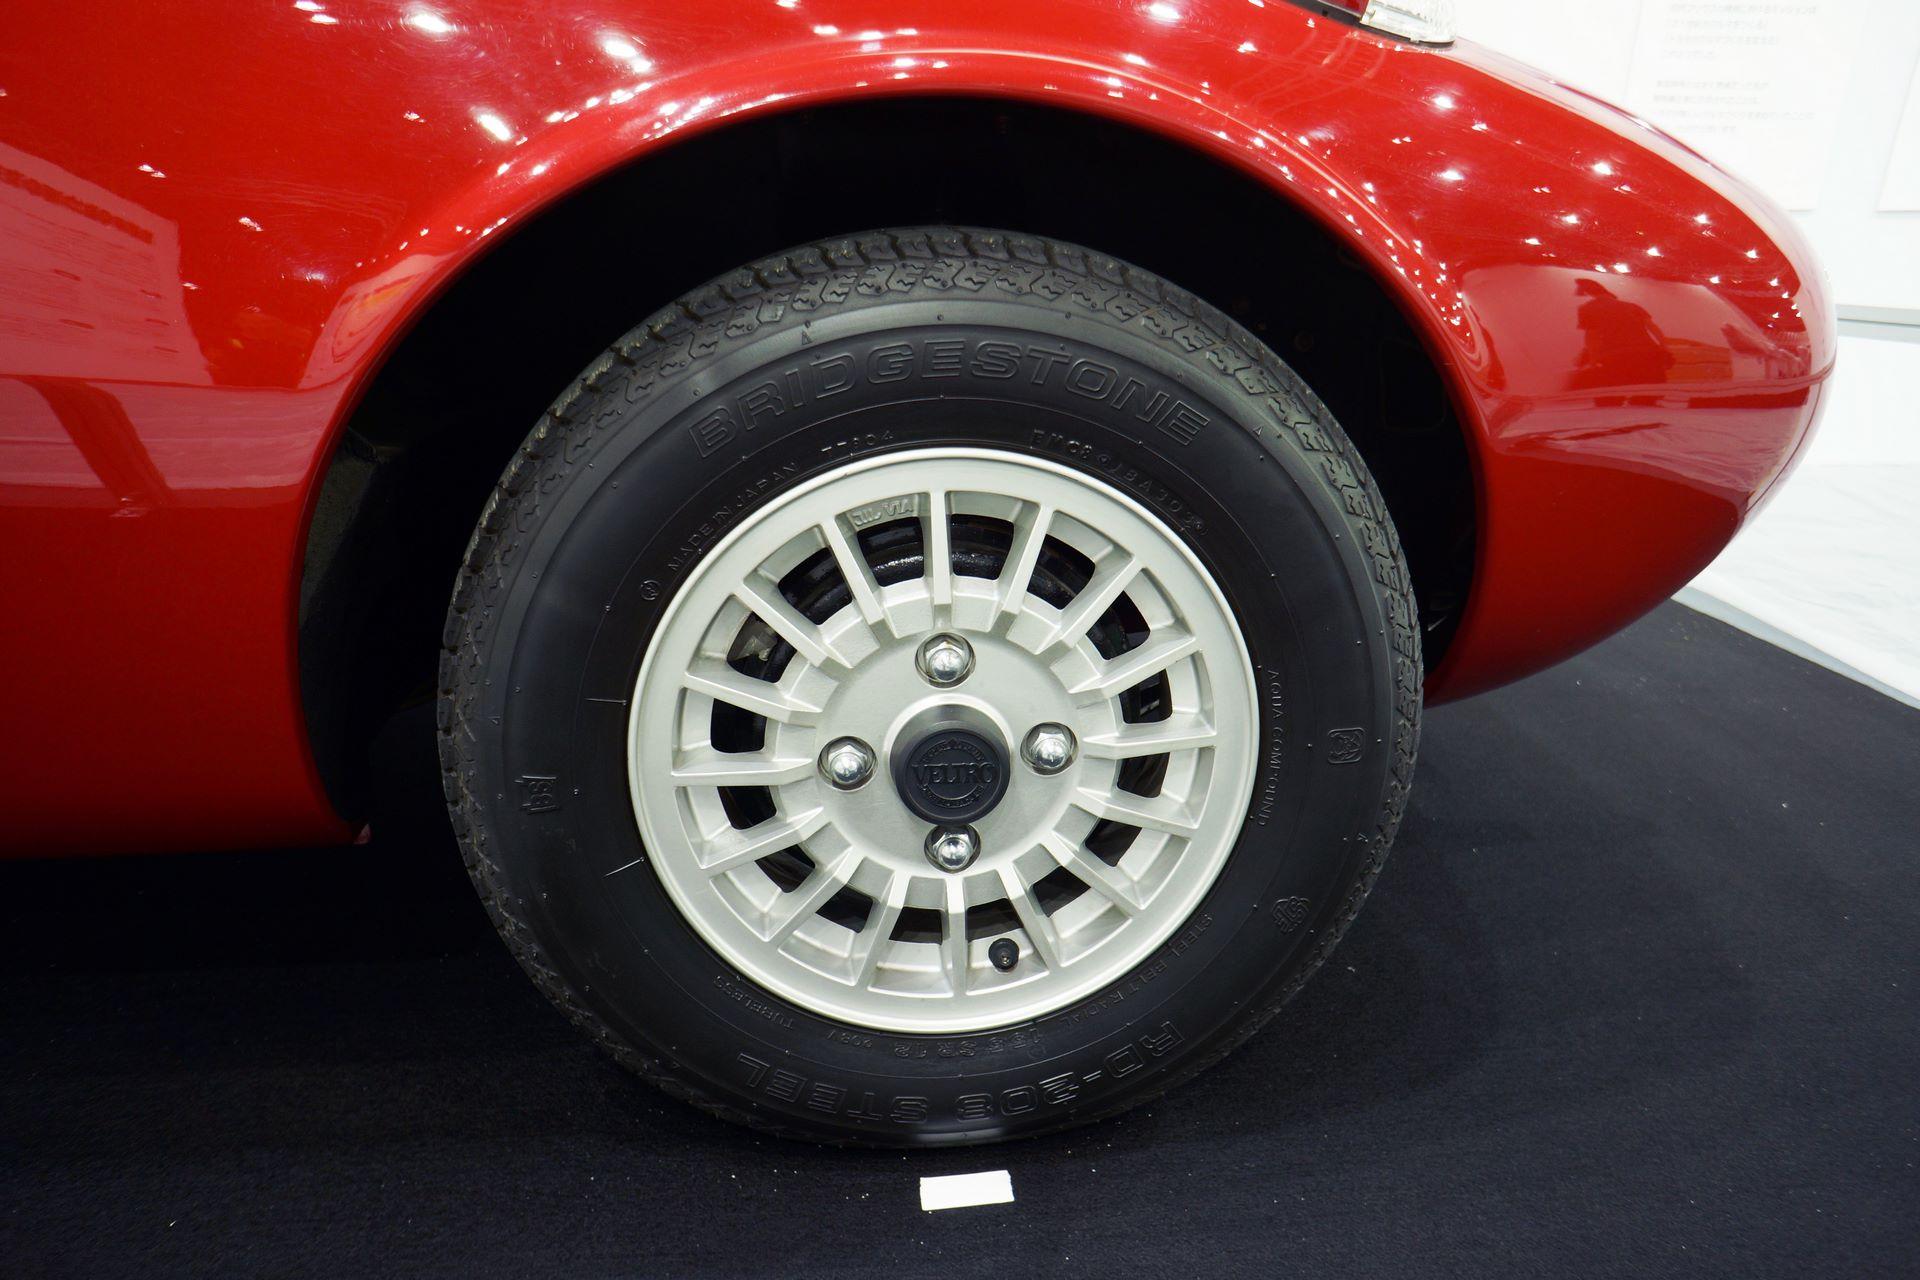 Toyota-Sports-800-Gas-Turbine-Hybrid-concept-1977-15